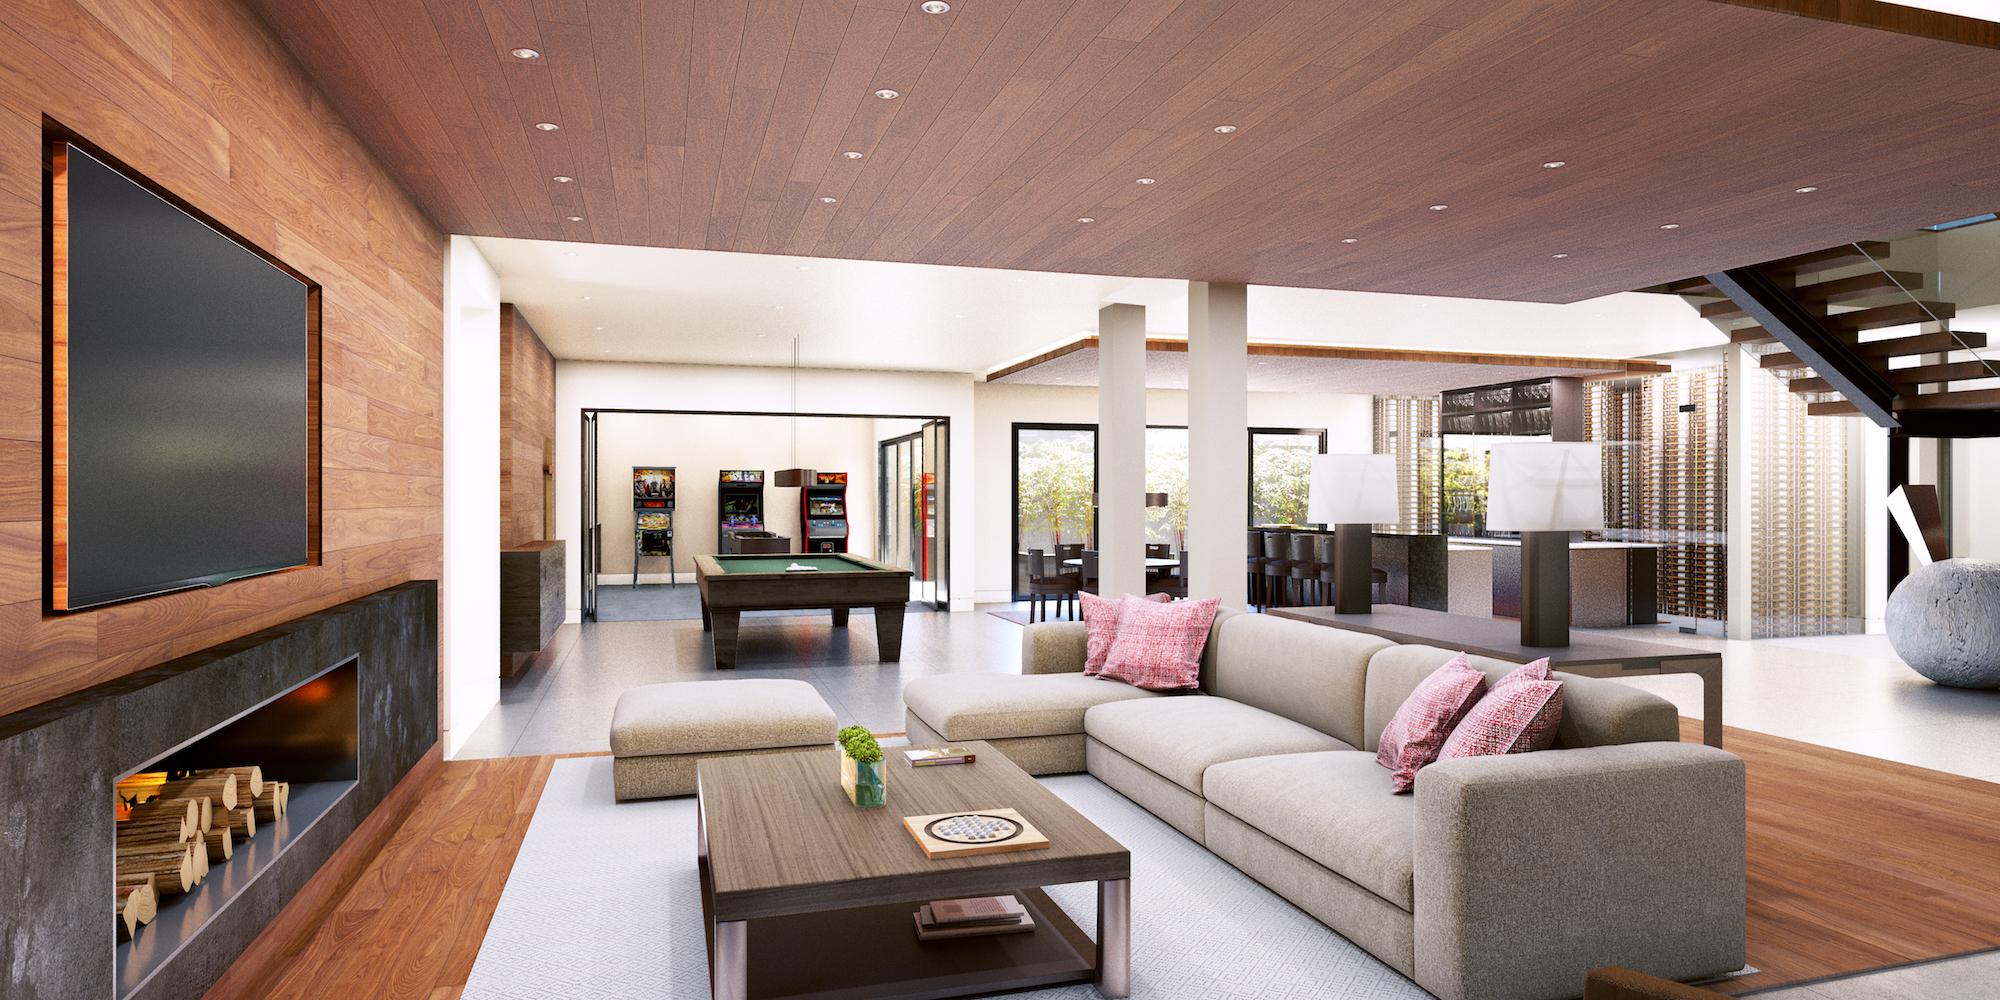 100 Interior Design Principles House Living Room